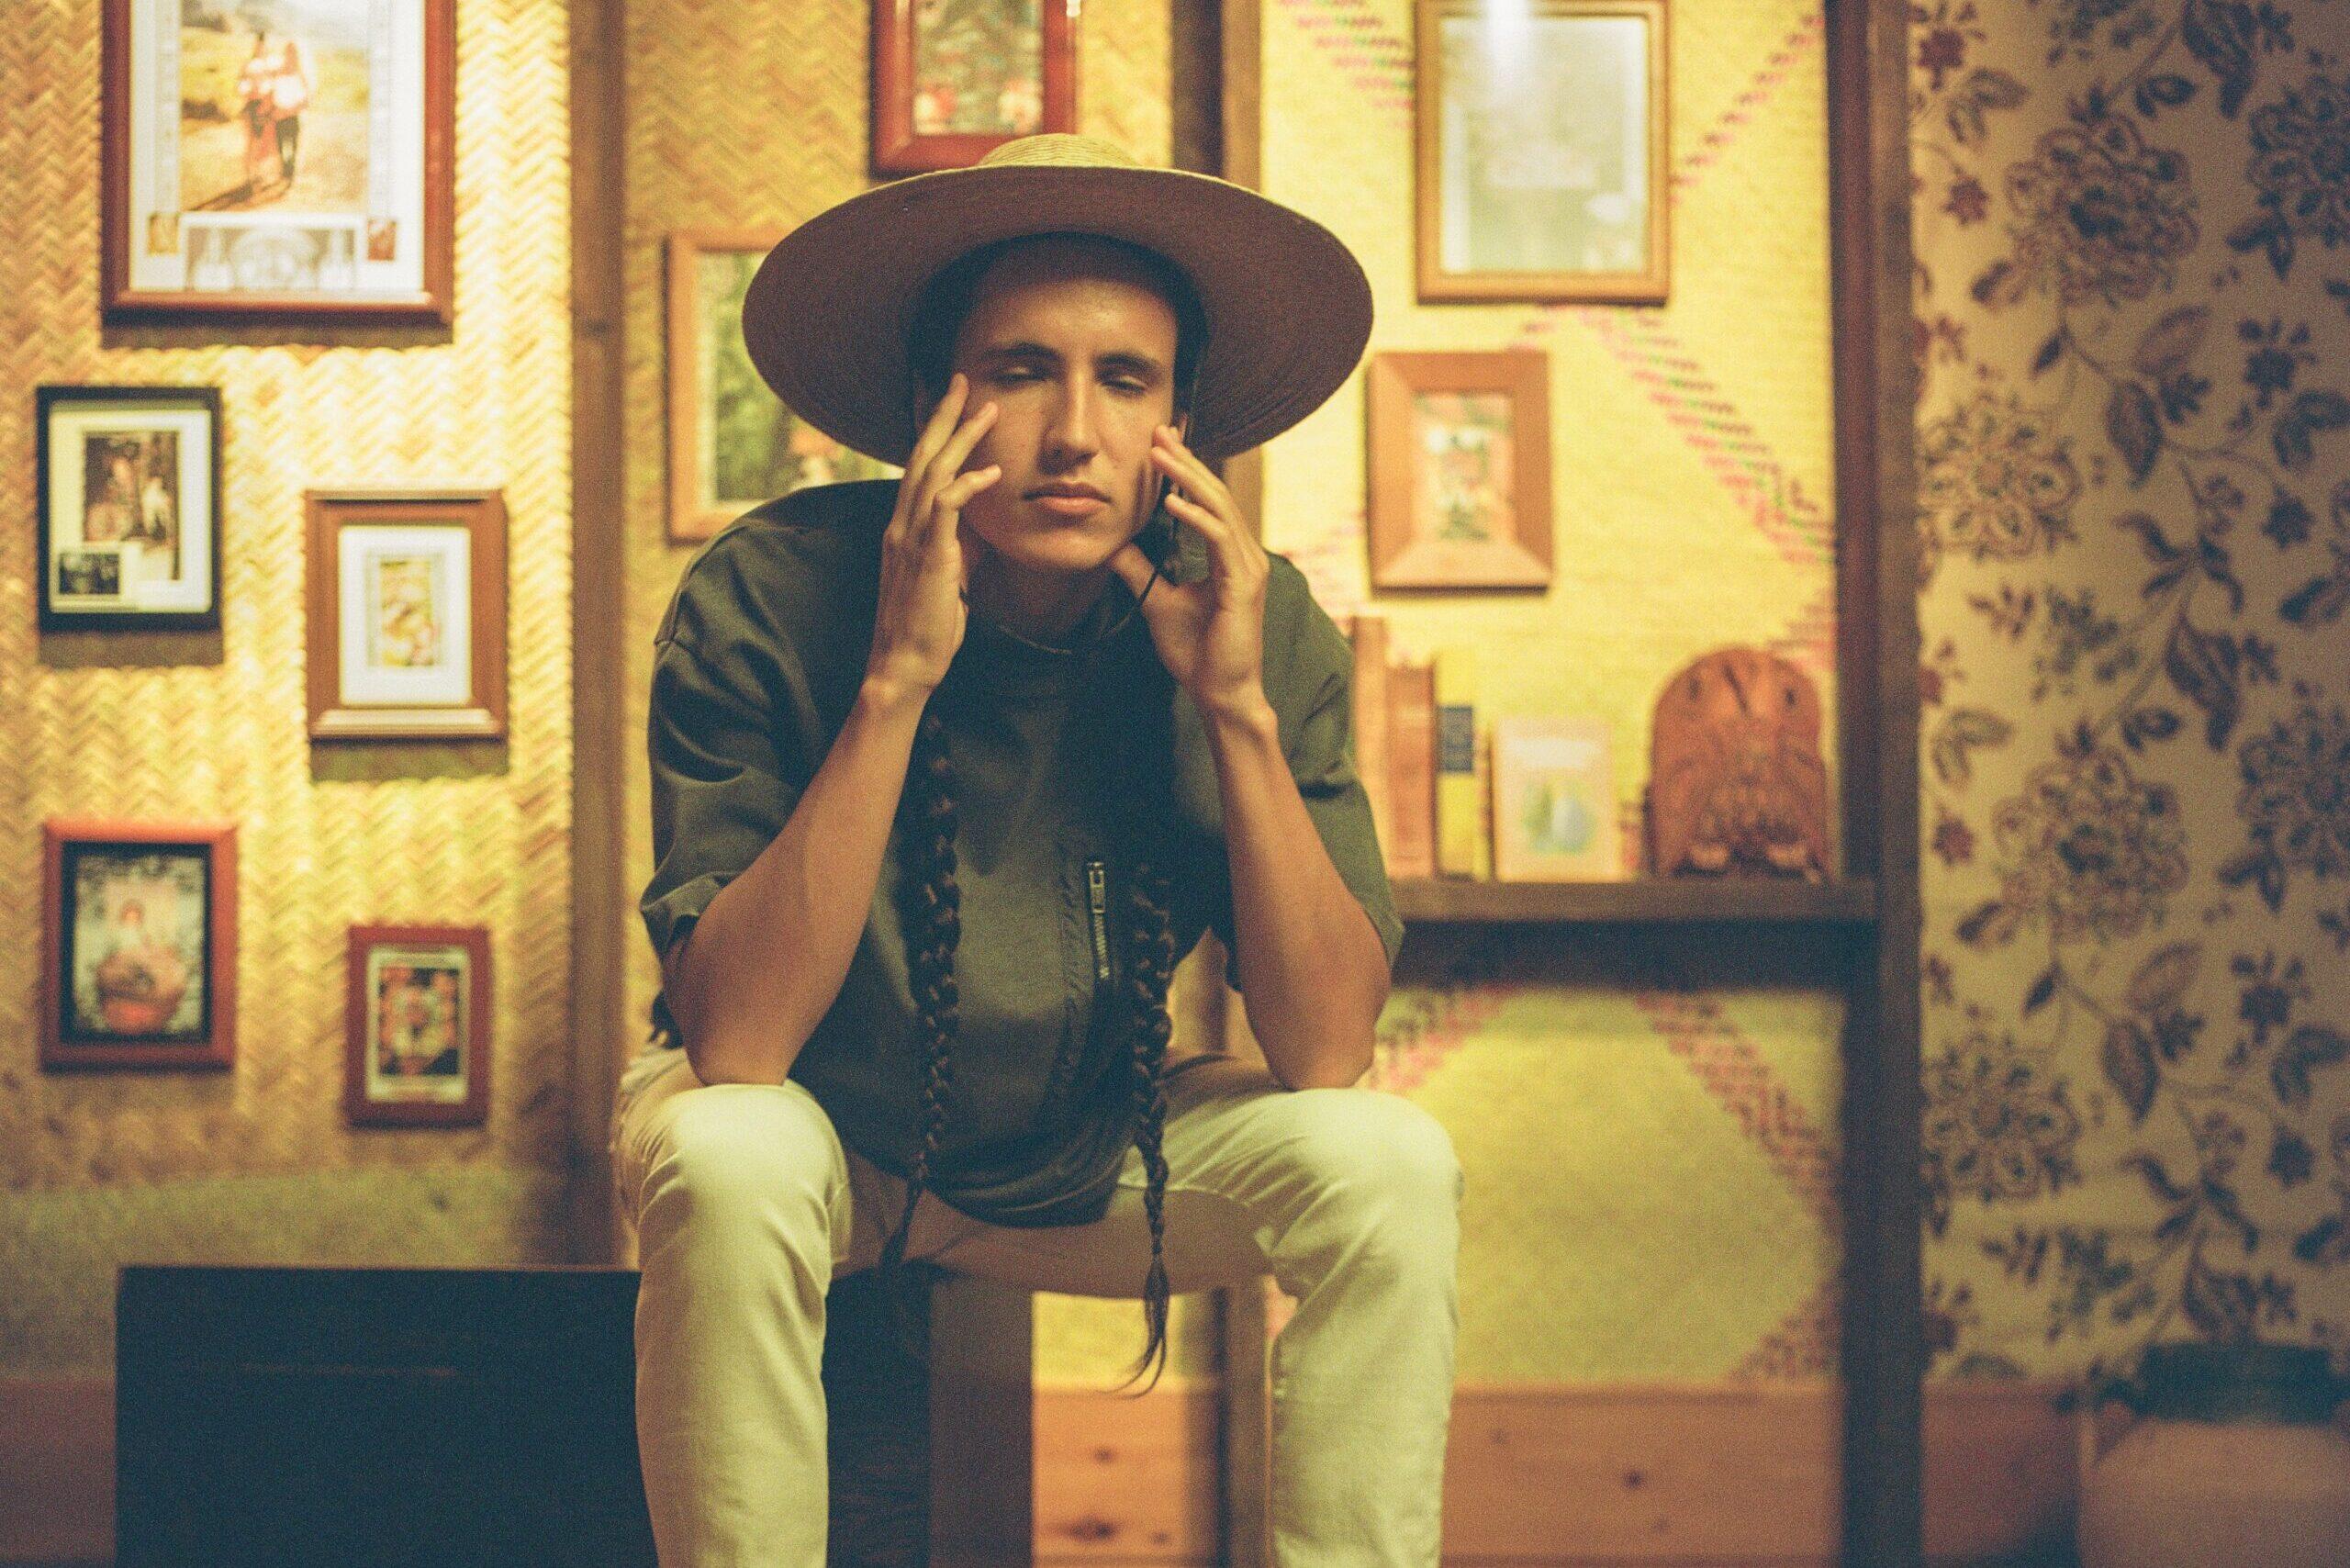 Xiuhtezcatl Martinez climate activist hip hop artist